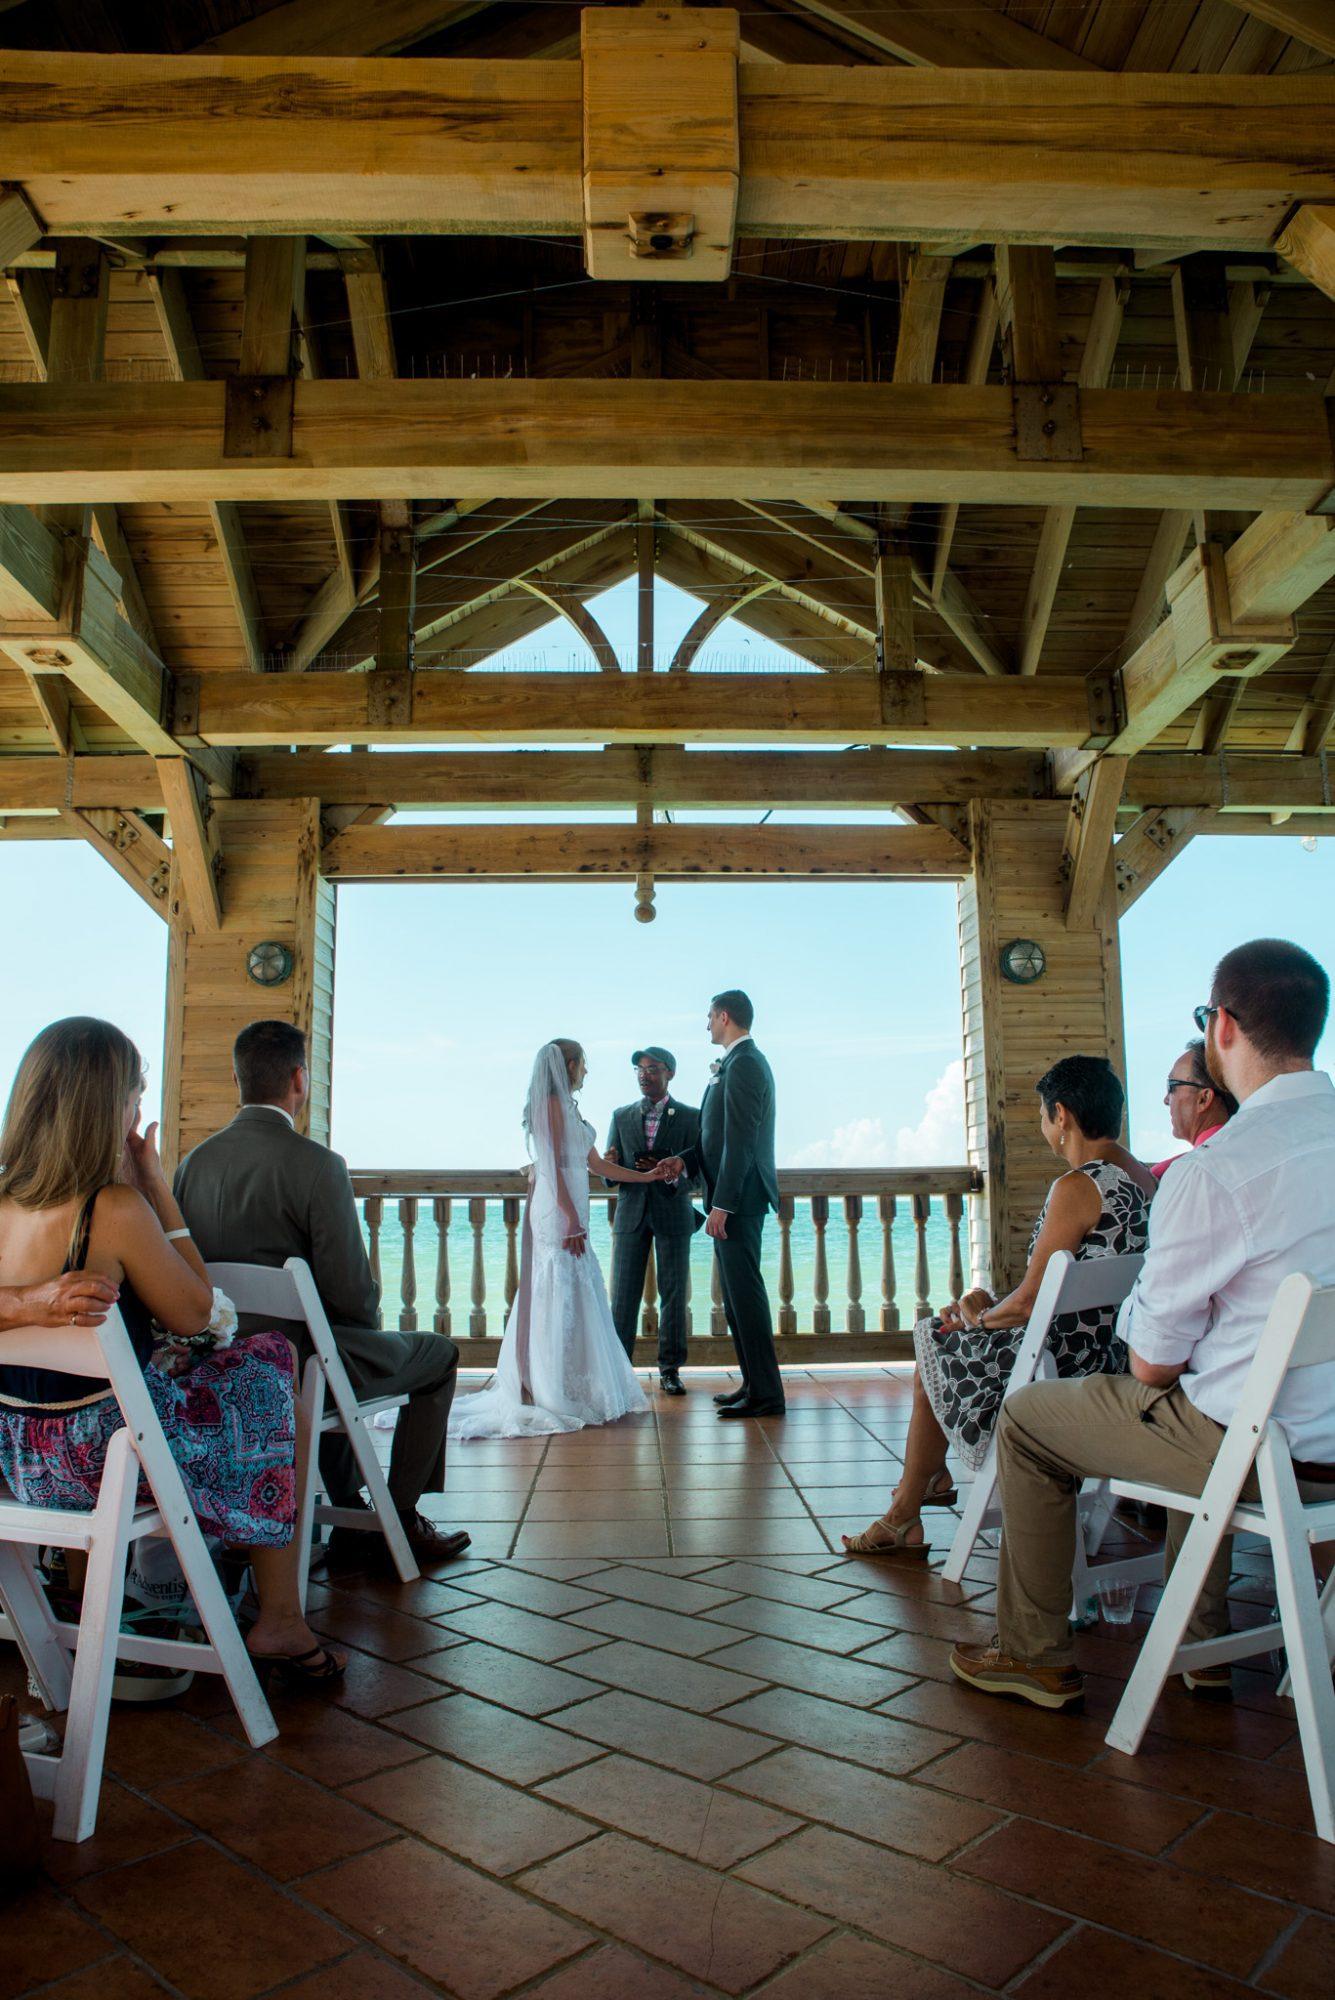 Stacey Jason Key West Wedding Photographer Reach Resort 20 - Stacy & Jason - Key West Wedding Photographer - Reach Resort